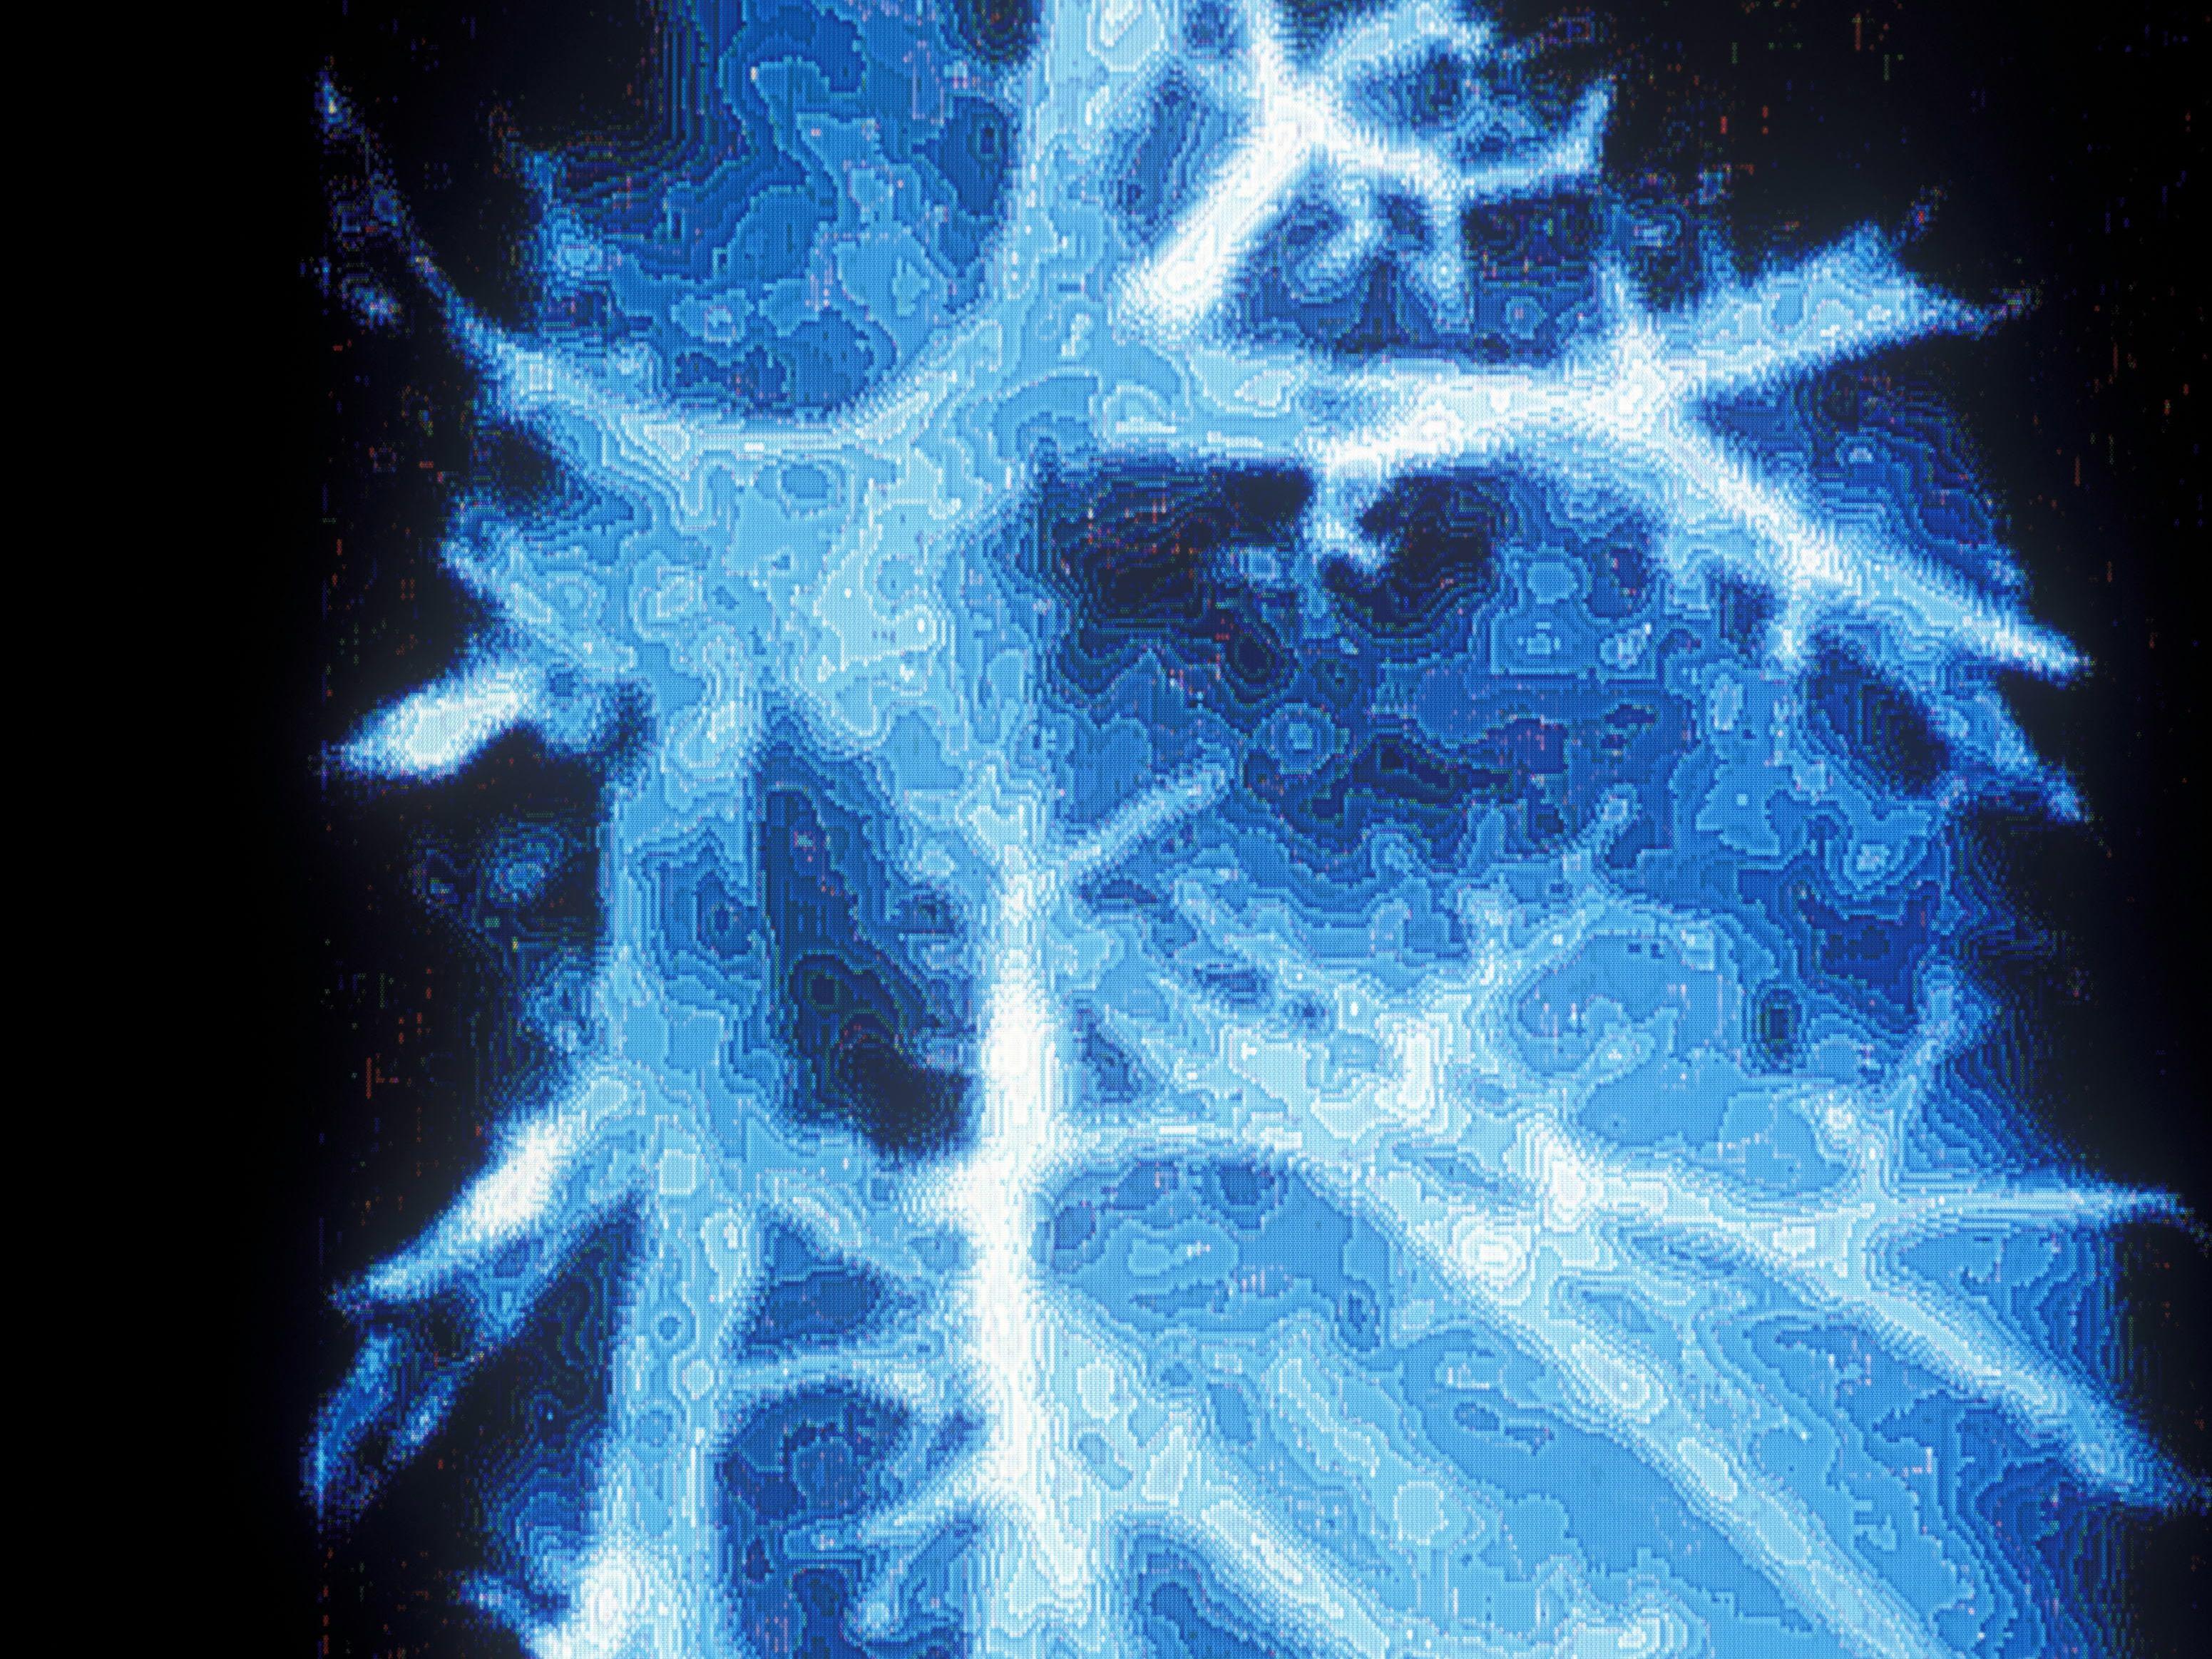 Bronchitis: Symptoms, Causes, Diagnosis, and Treatment